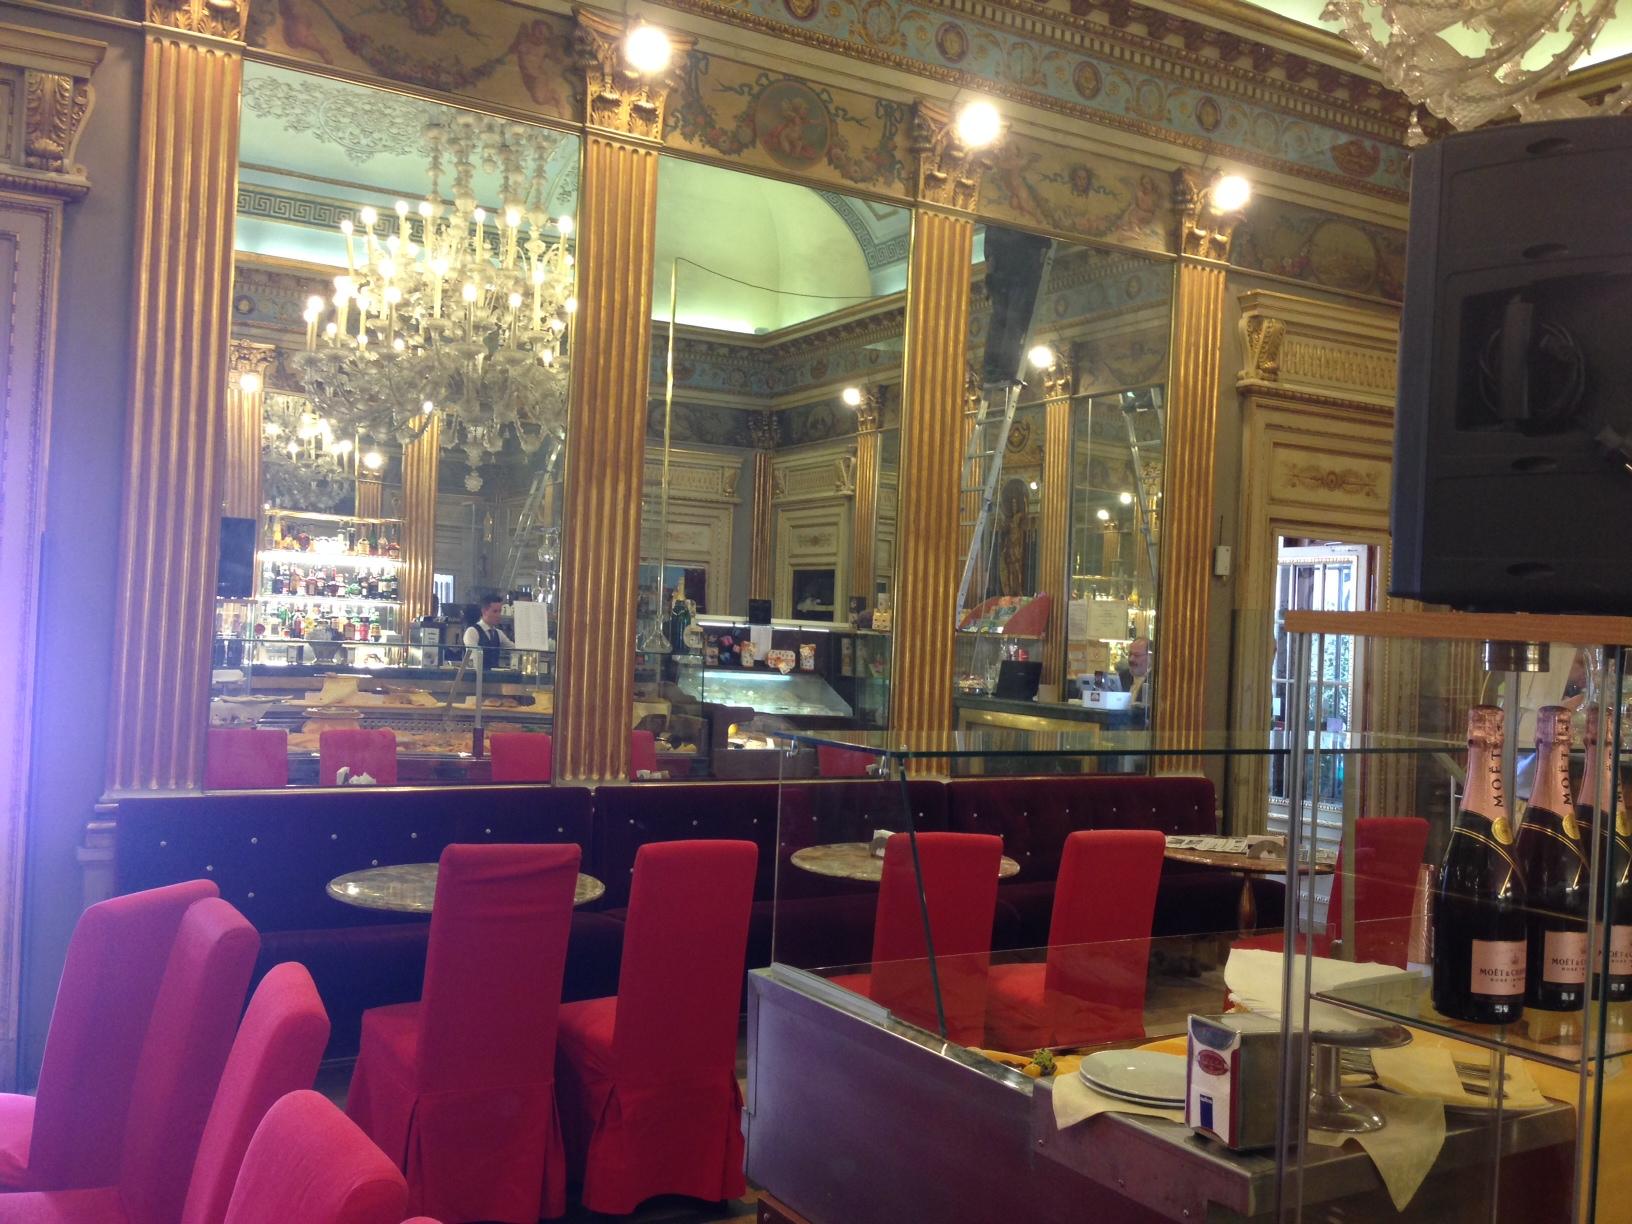 Продажа бизнеса в Италии - ресторан в центре Турина